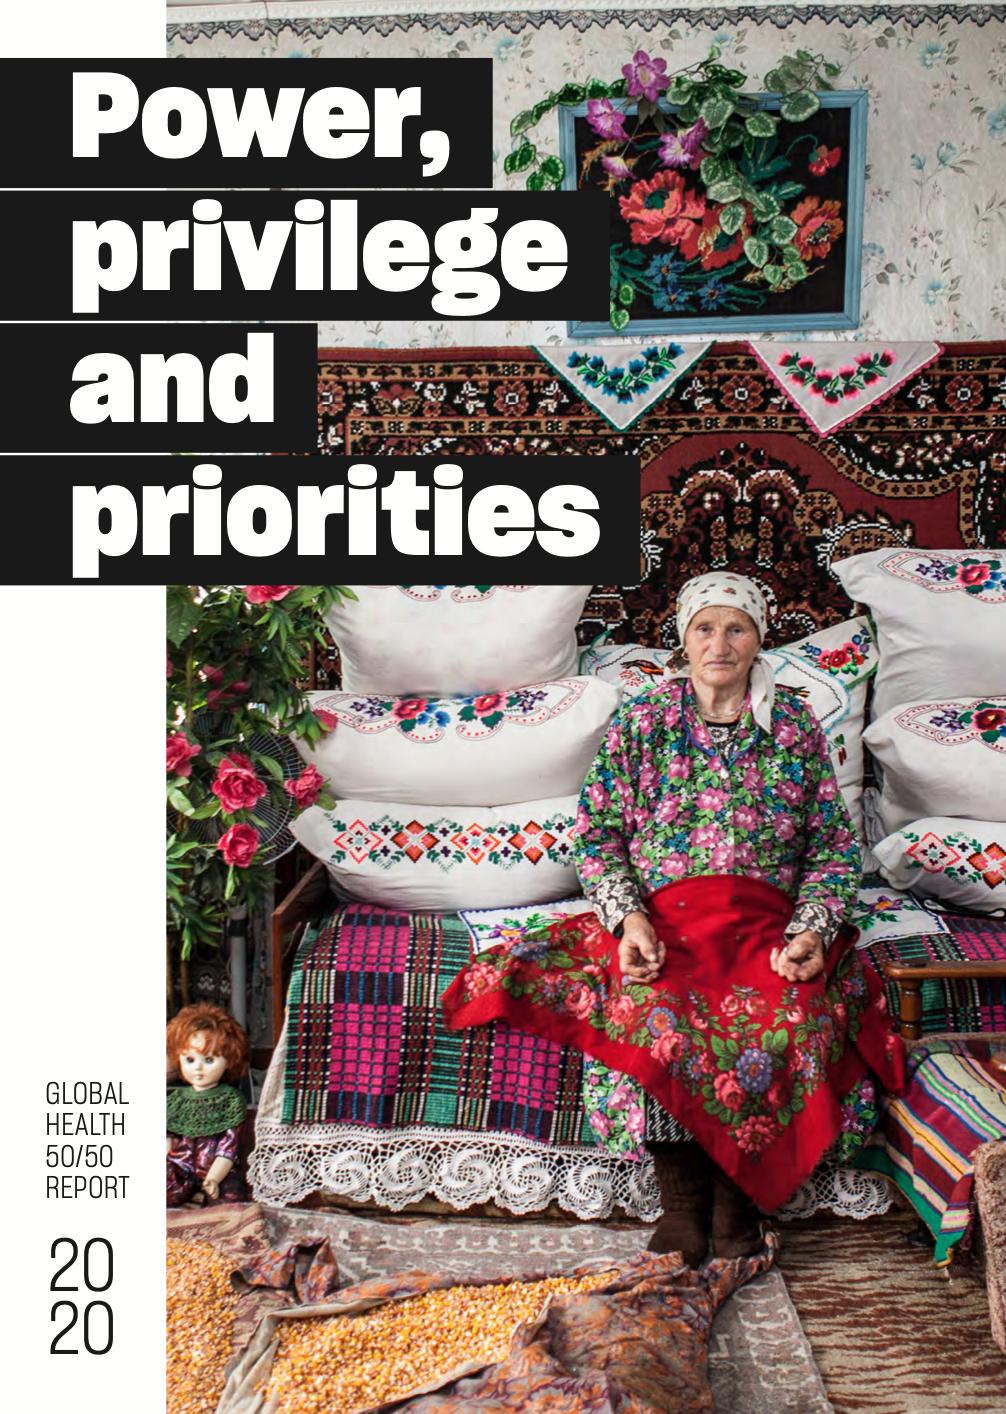 Power, privilege and priorities: global health 50/50 report 2020